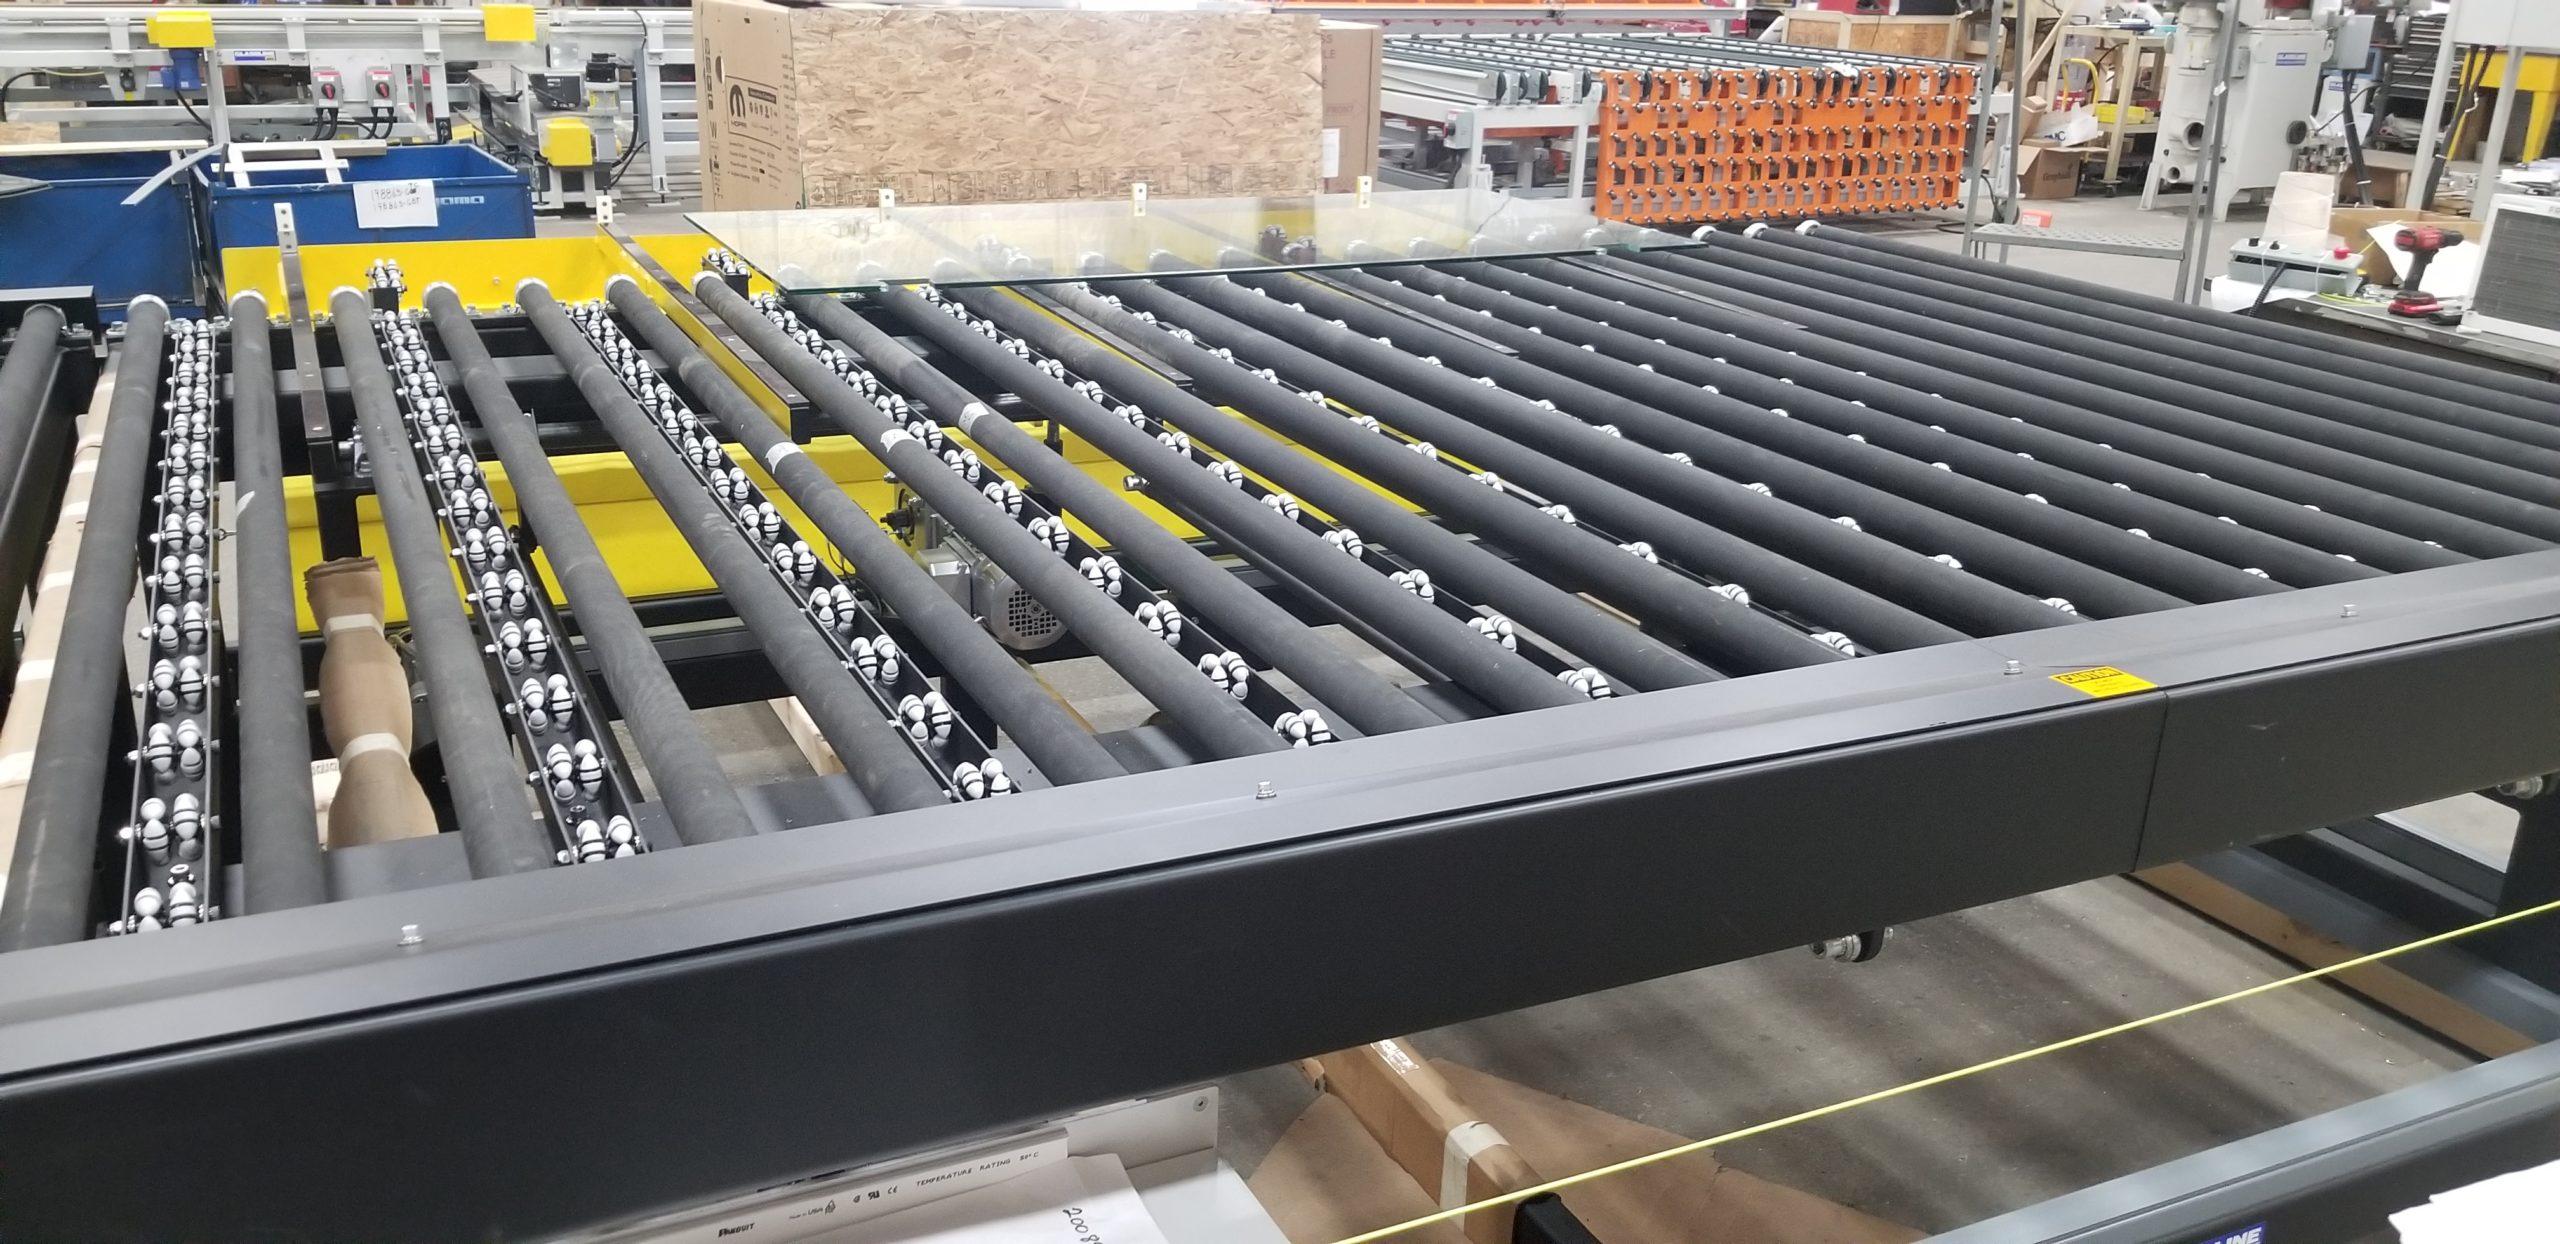 Lite-Sentry Vision Inspection Conveyors - Glassline 2